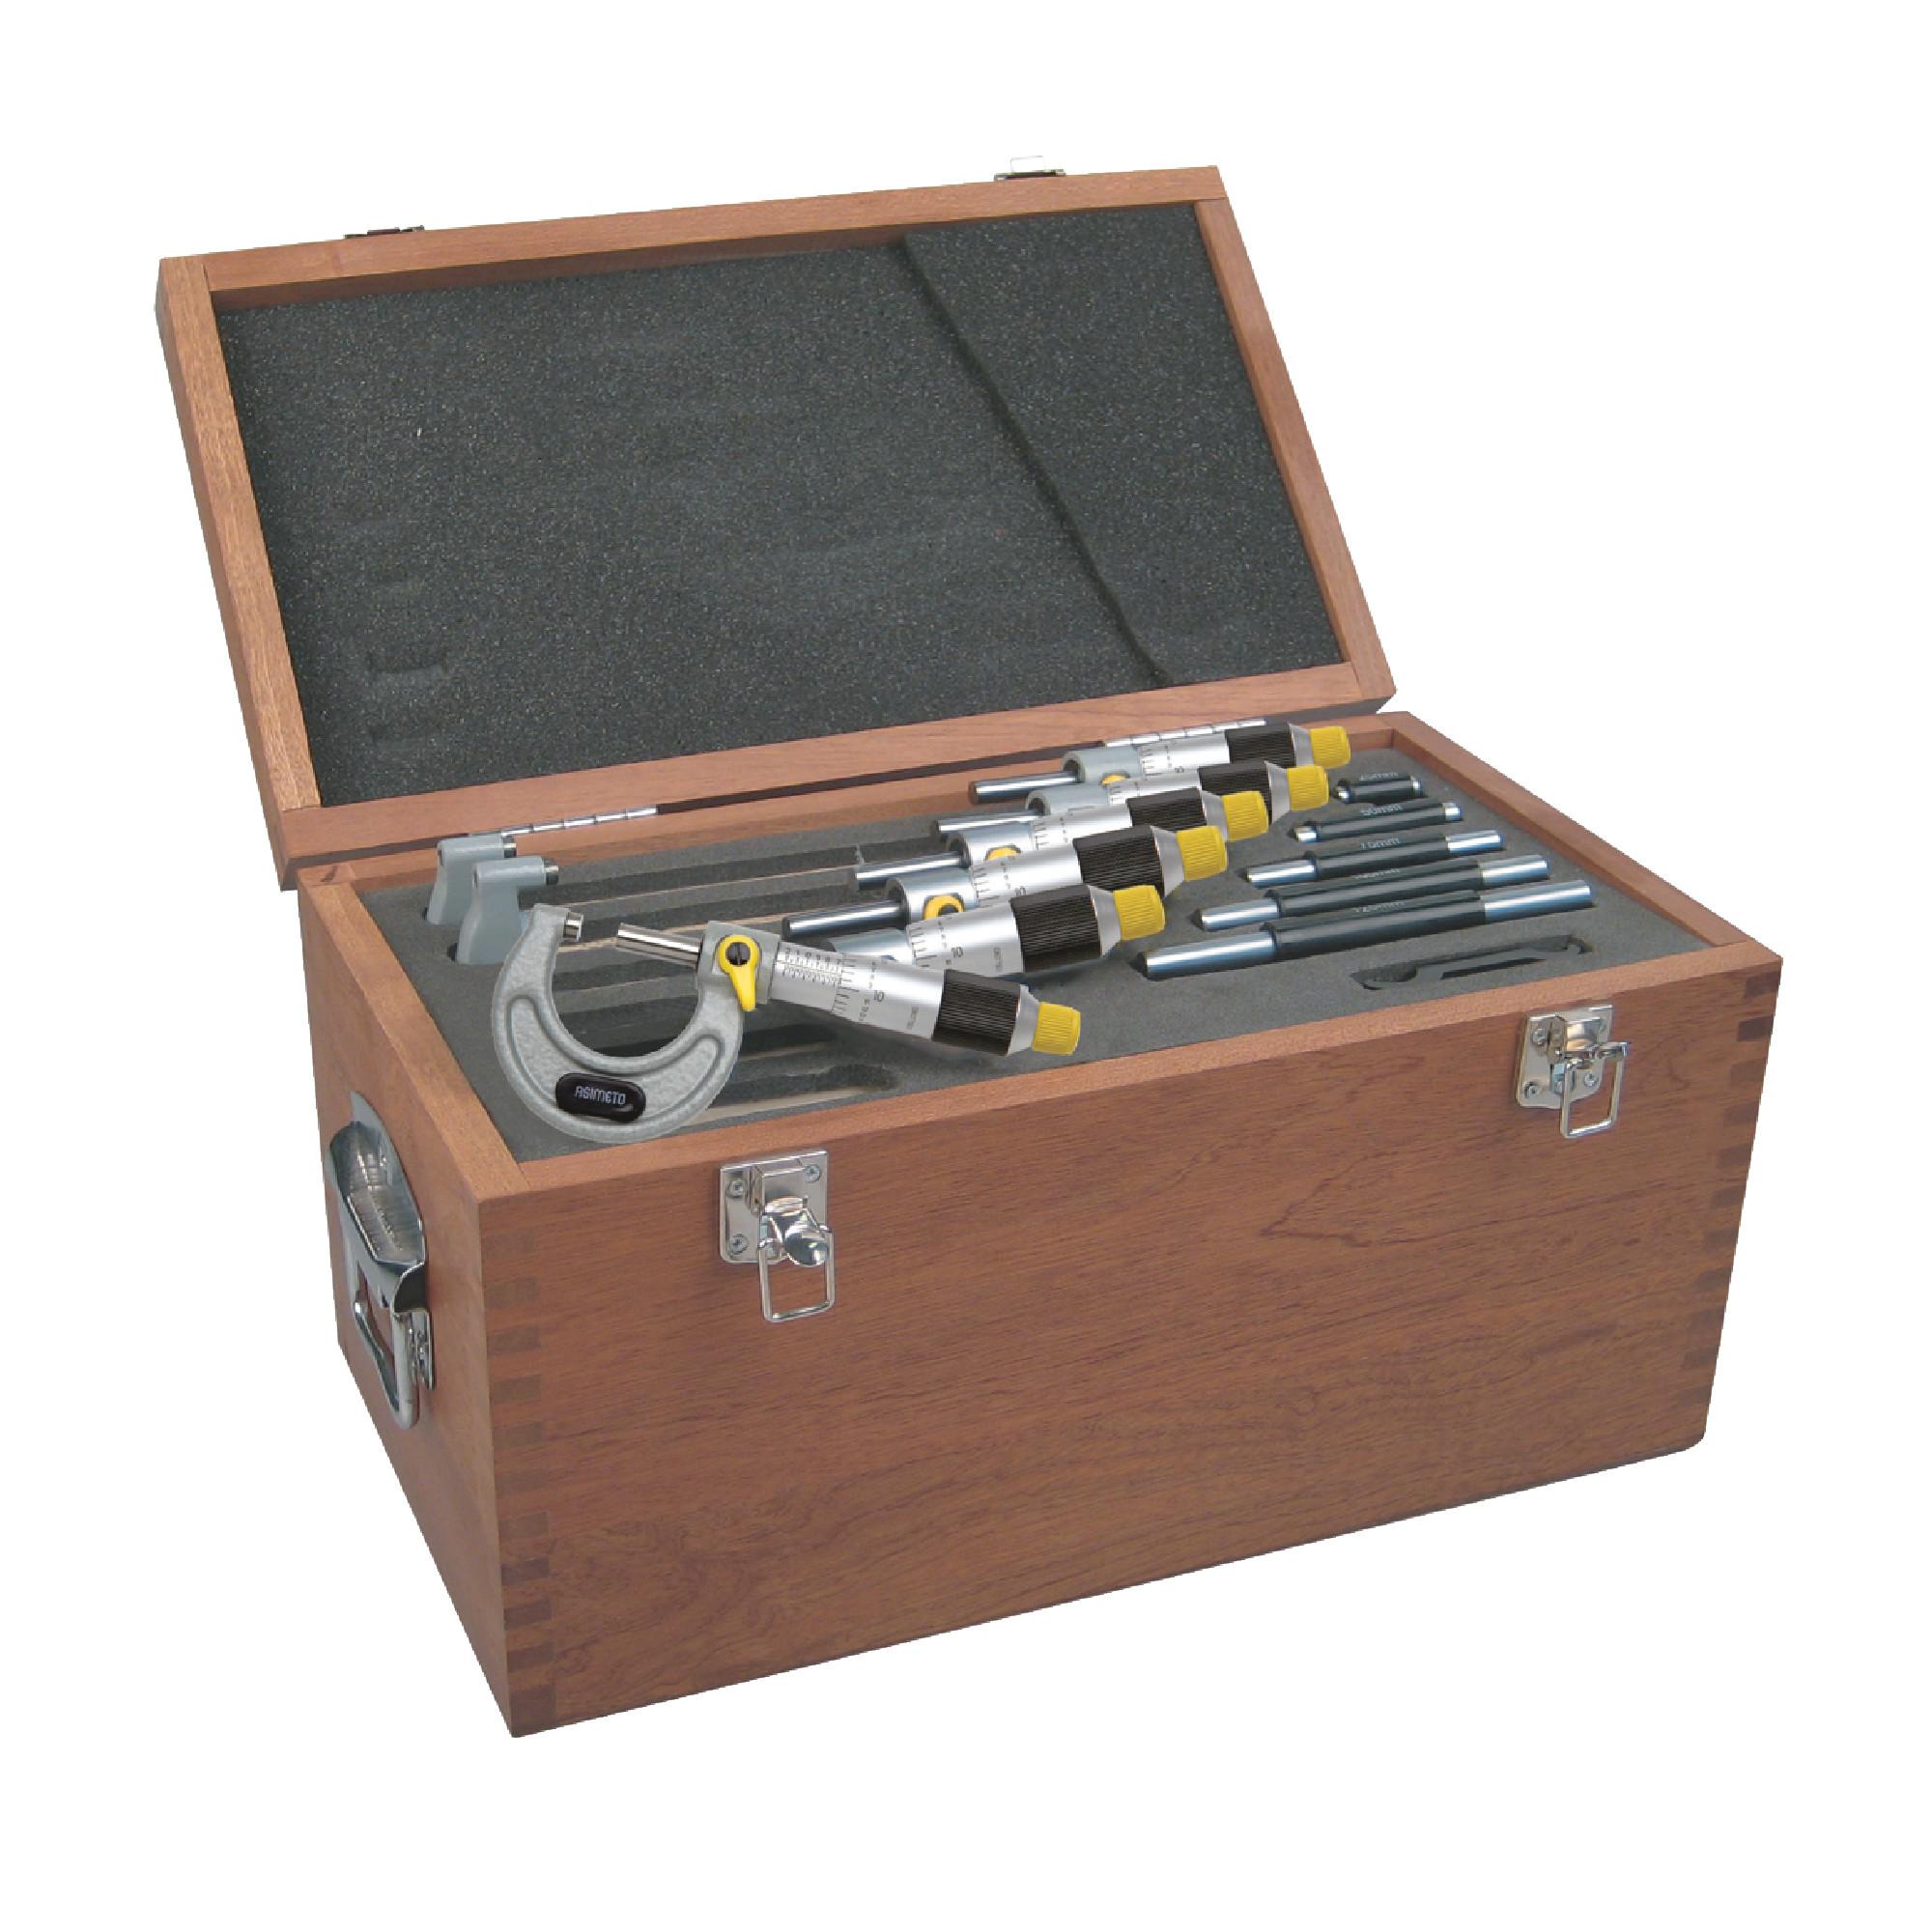 "0-6"" Precision Outside Micrometer Set"